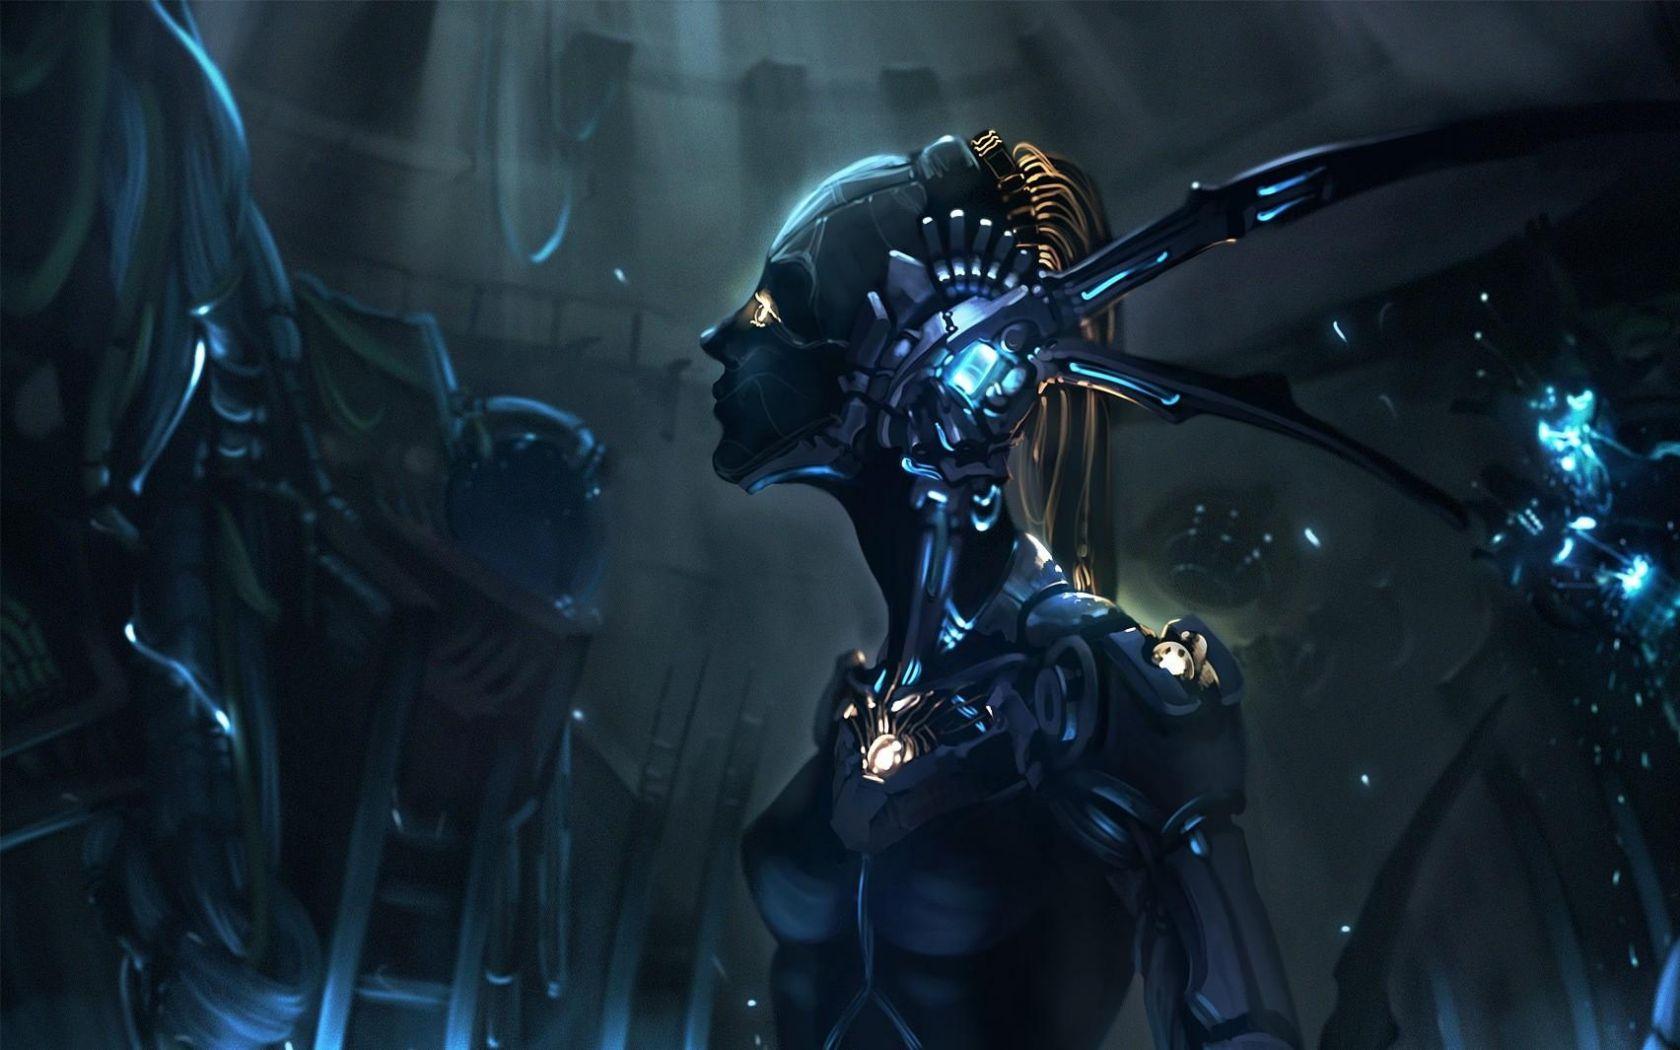 1680x1050 Wallpaper robot cyborg mechanism girl Sci Fi Sci 1680x1050